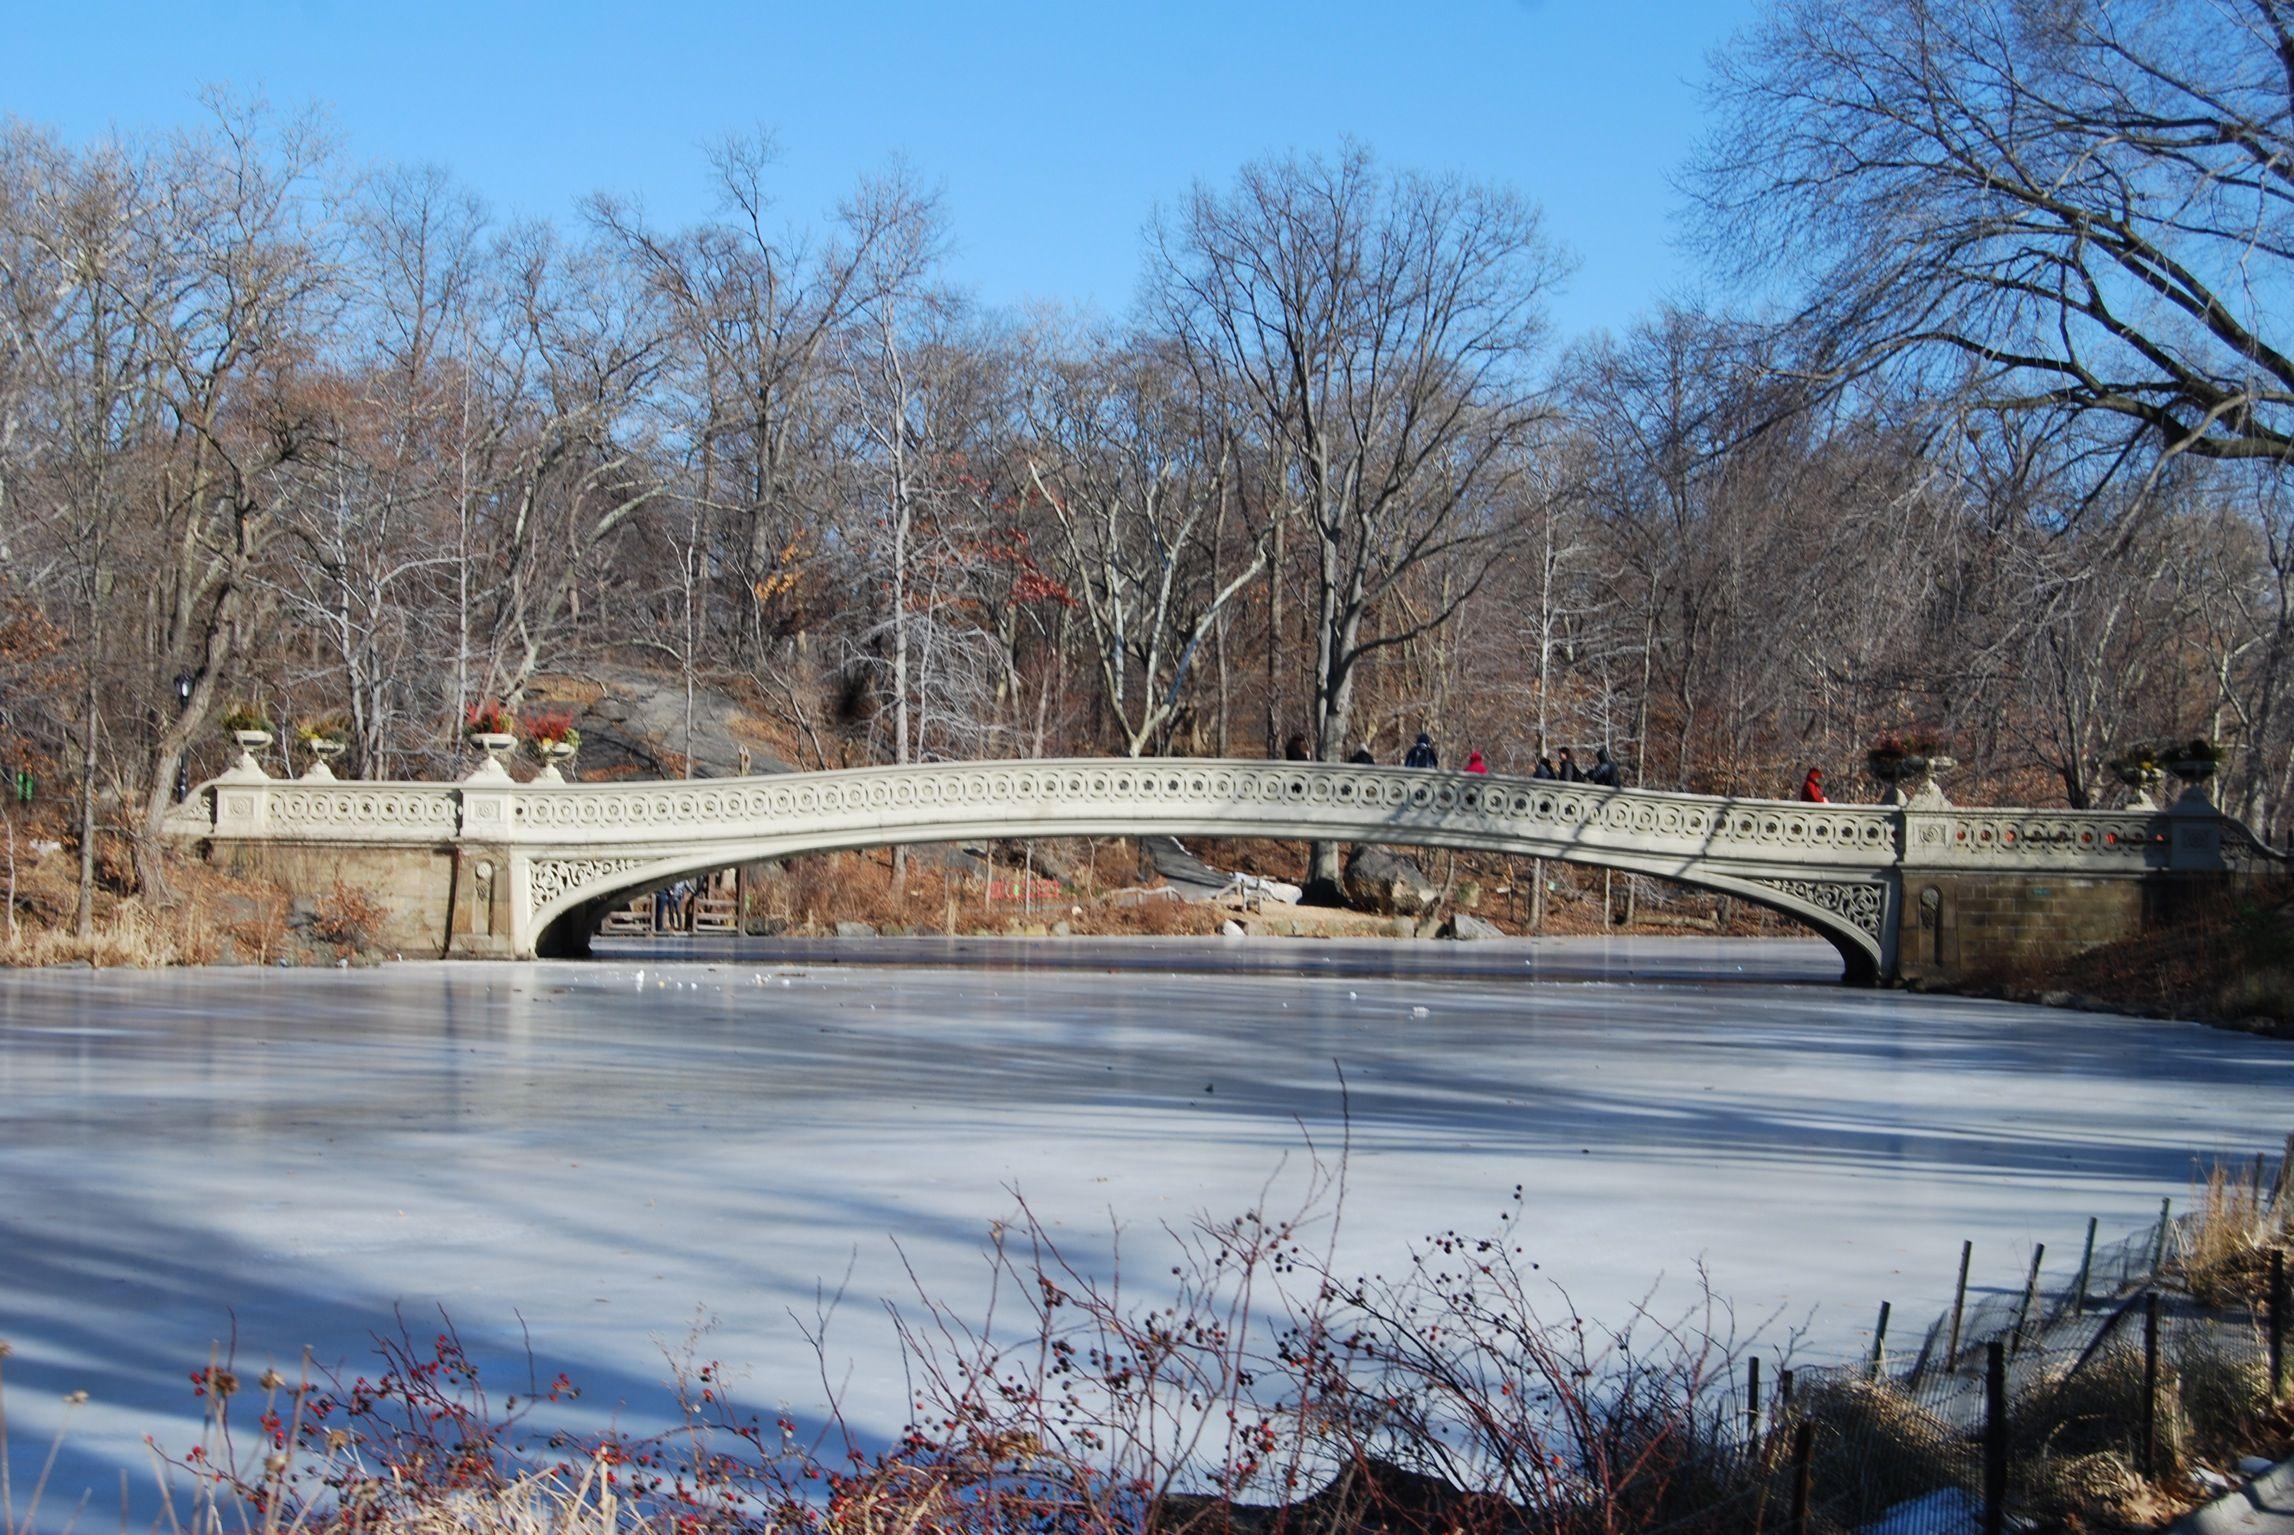 Central Park #winter #nyc #ny #newyork #manhattan #ice #cold #bridge